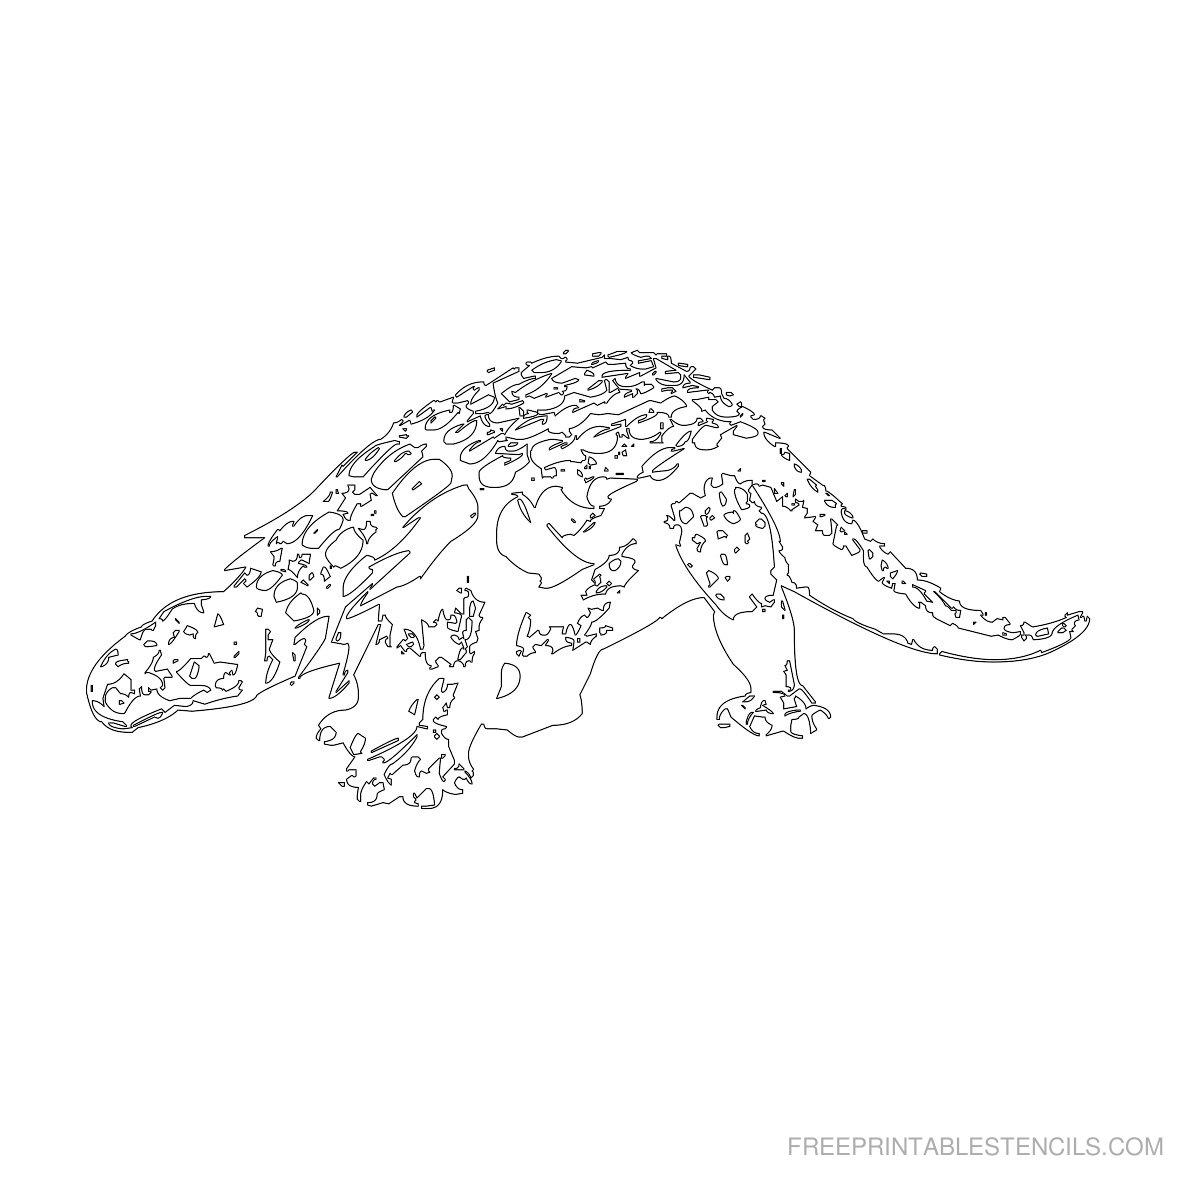 Free Printable Dinosaur Stencil J